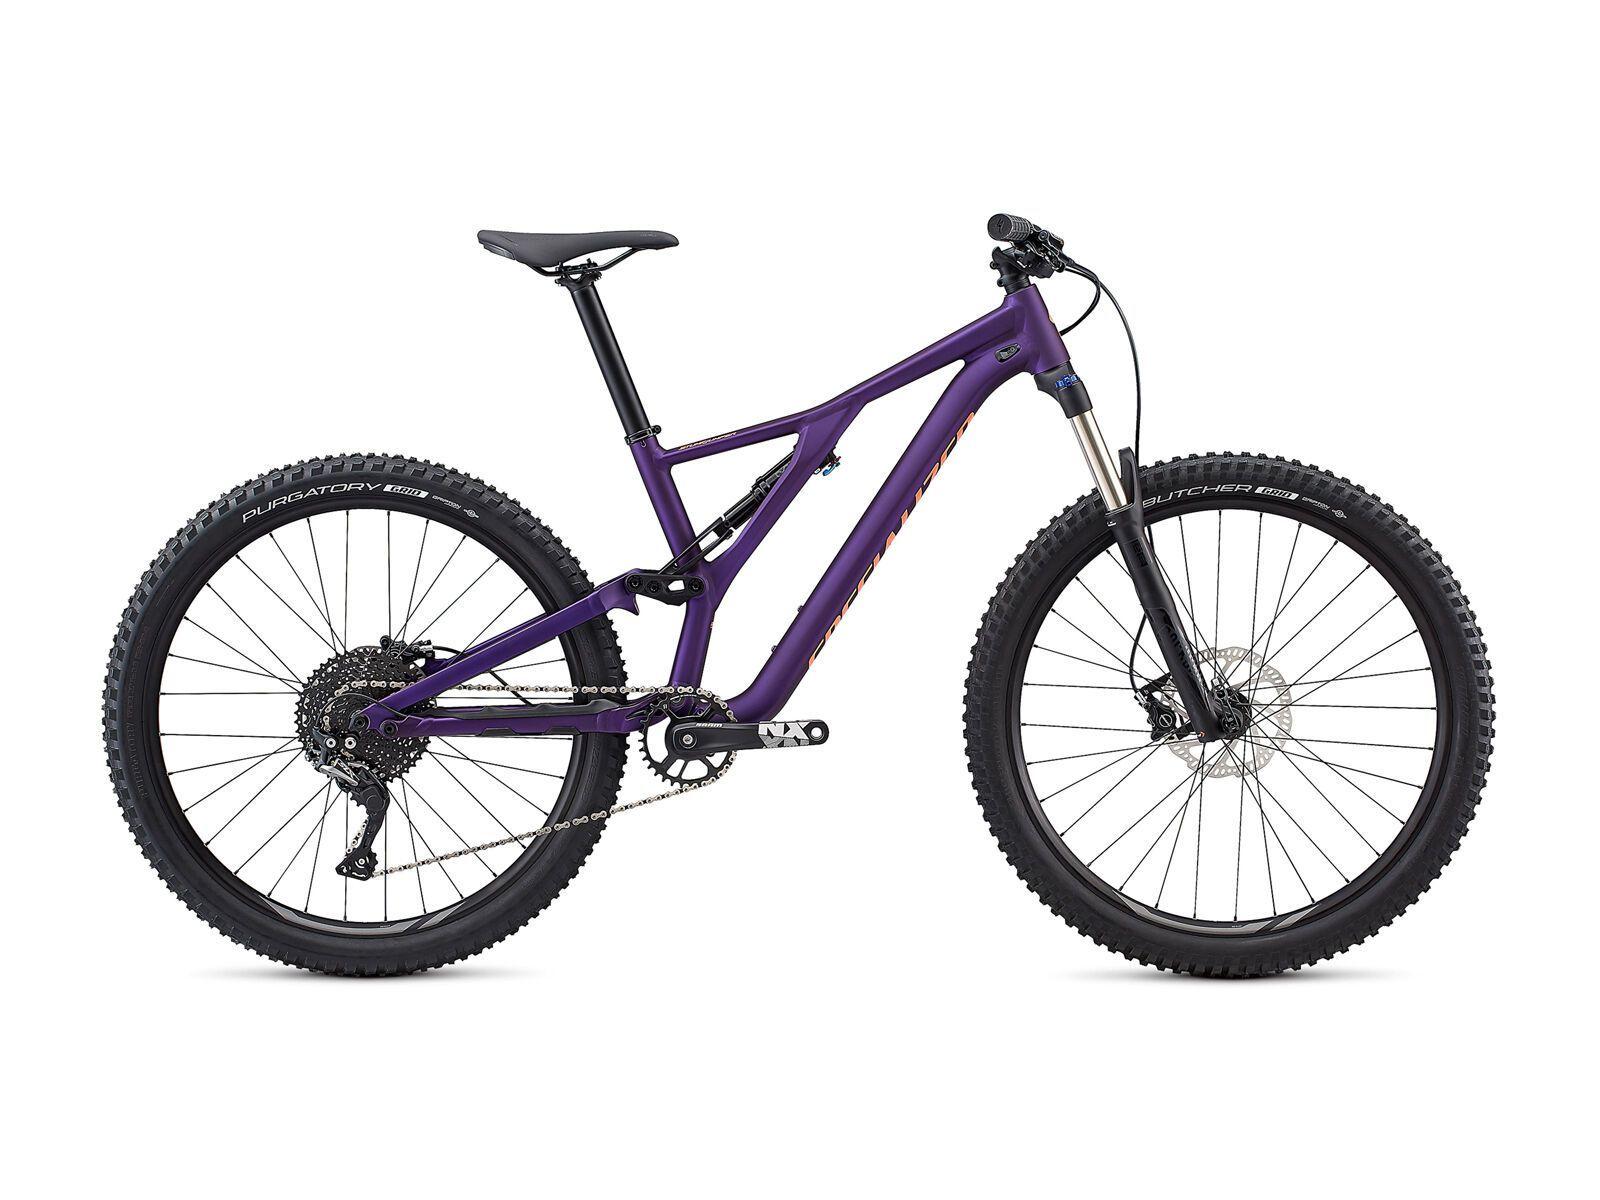 *** 2. Wahl *** Specialized Women's Stumpjumper ST Alloy 27.5 2019, plum purple/acid lava - Mountainbike | Größe M // 41 cm | Bild 1